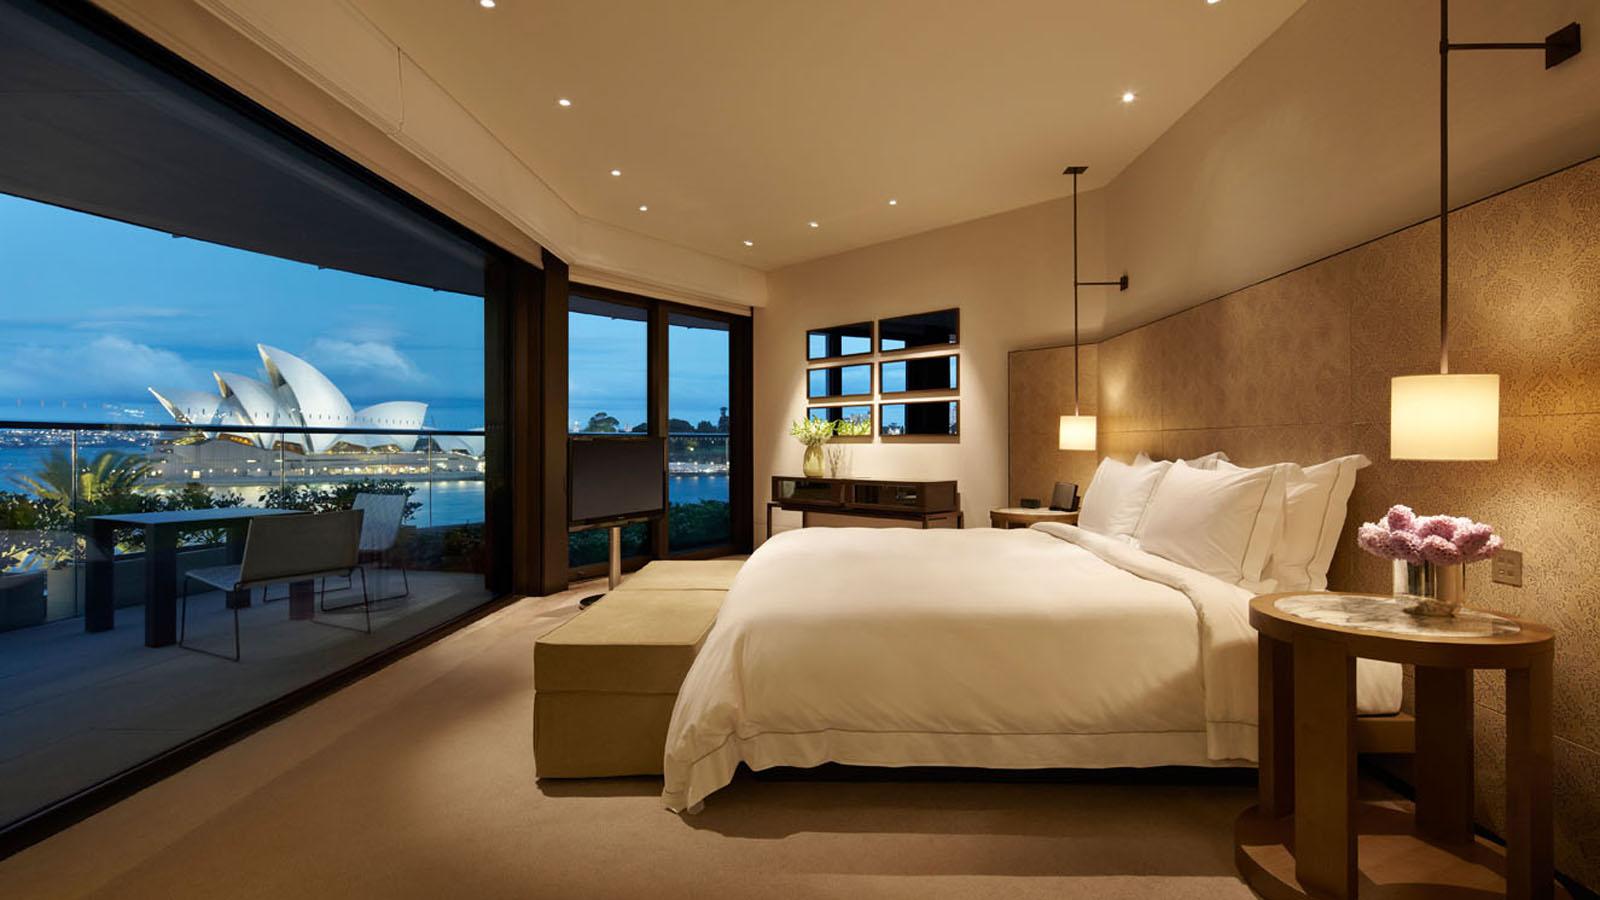 A Room With A View Park Hyatt Sydney Carrier